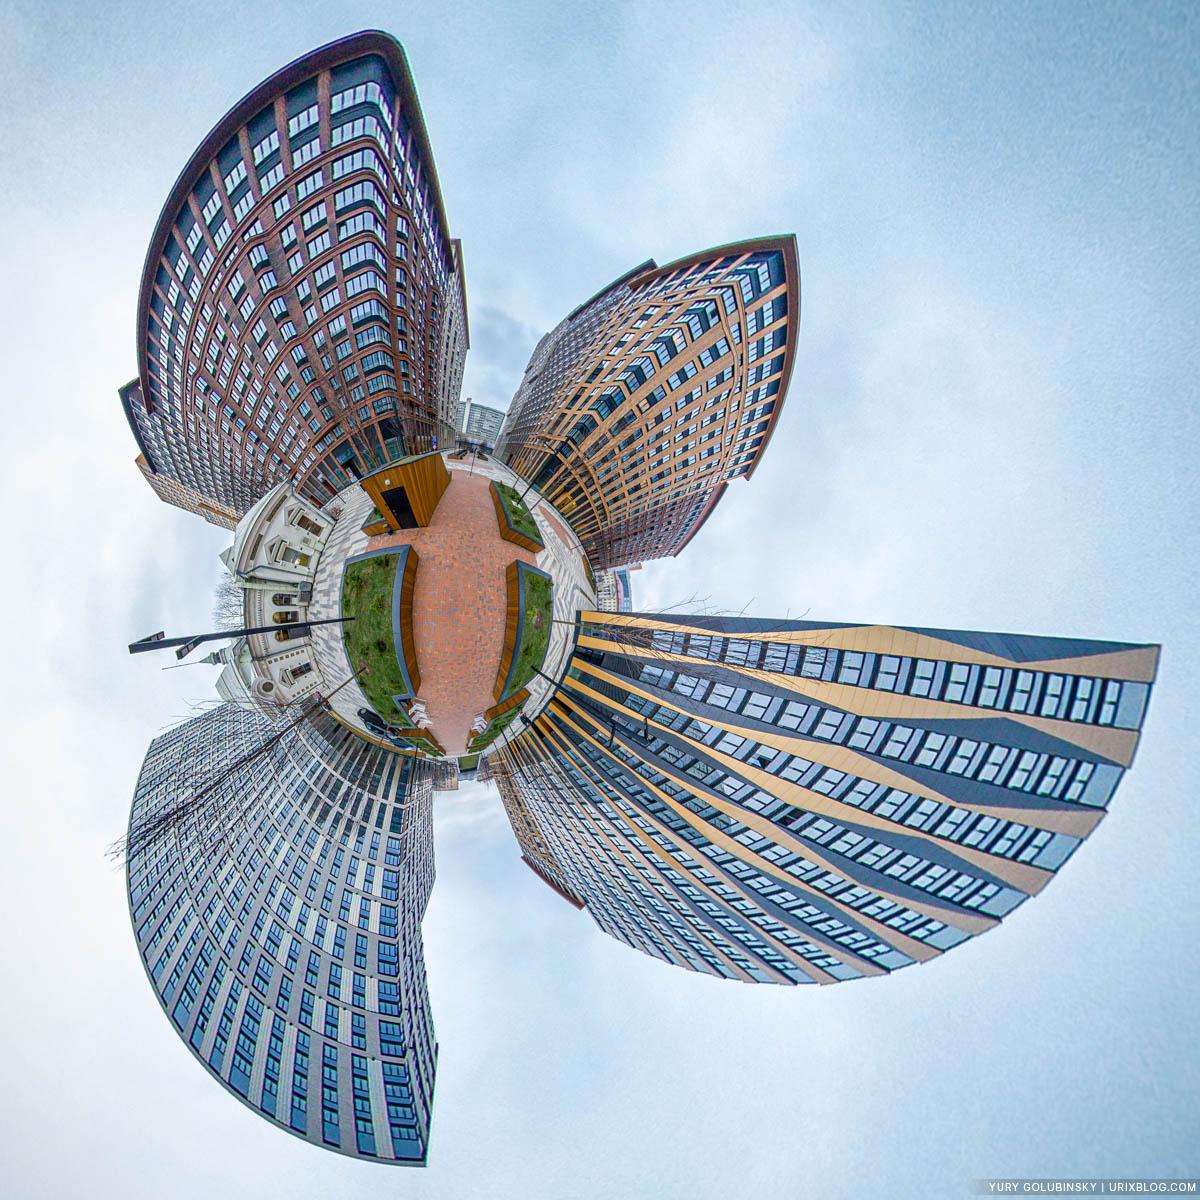 Parisienne restaurant, Tsarskaya Ploshchad, little planet, tiny planet, panorama, Moscow, Russia, 2020